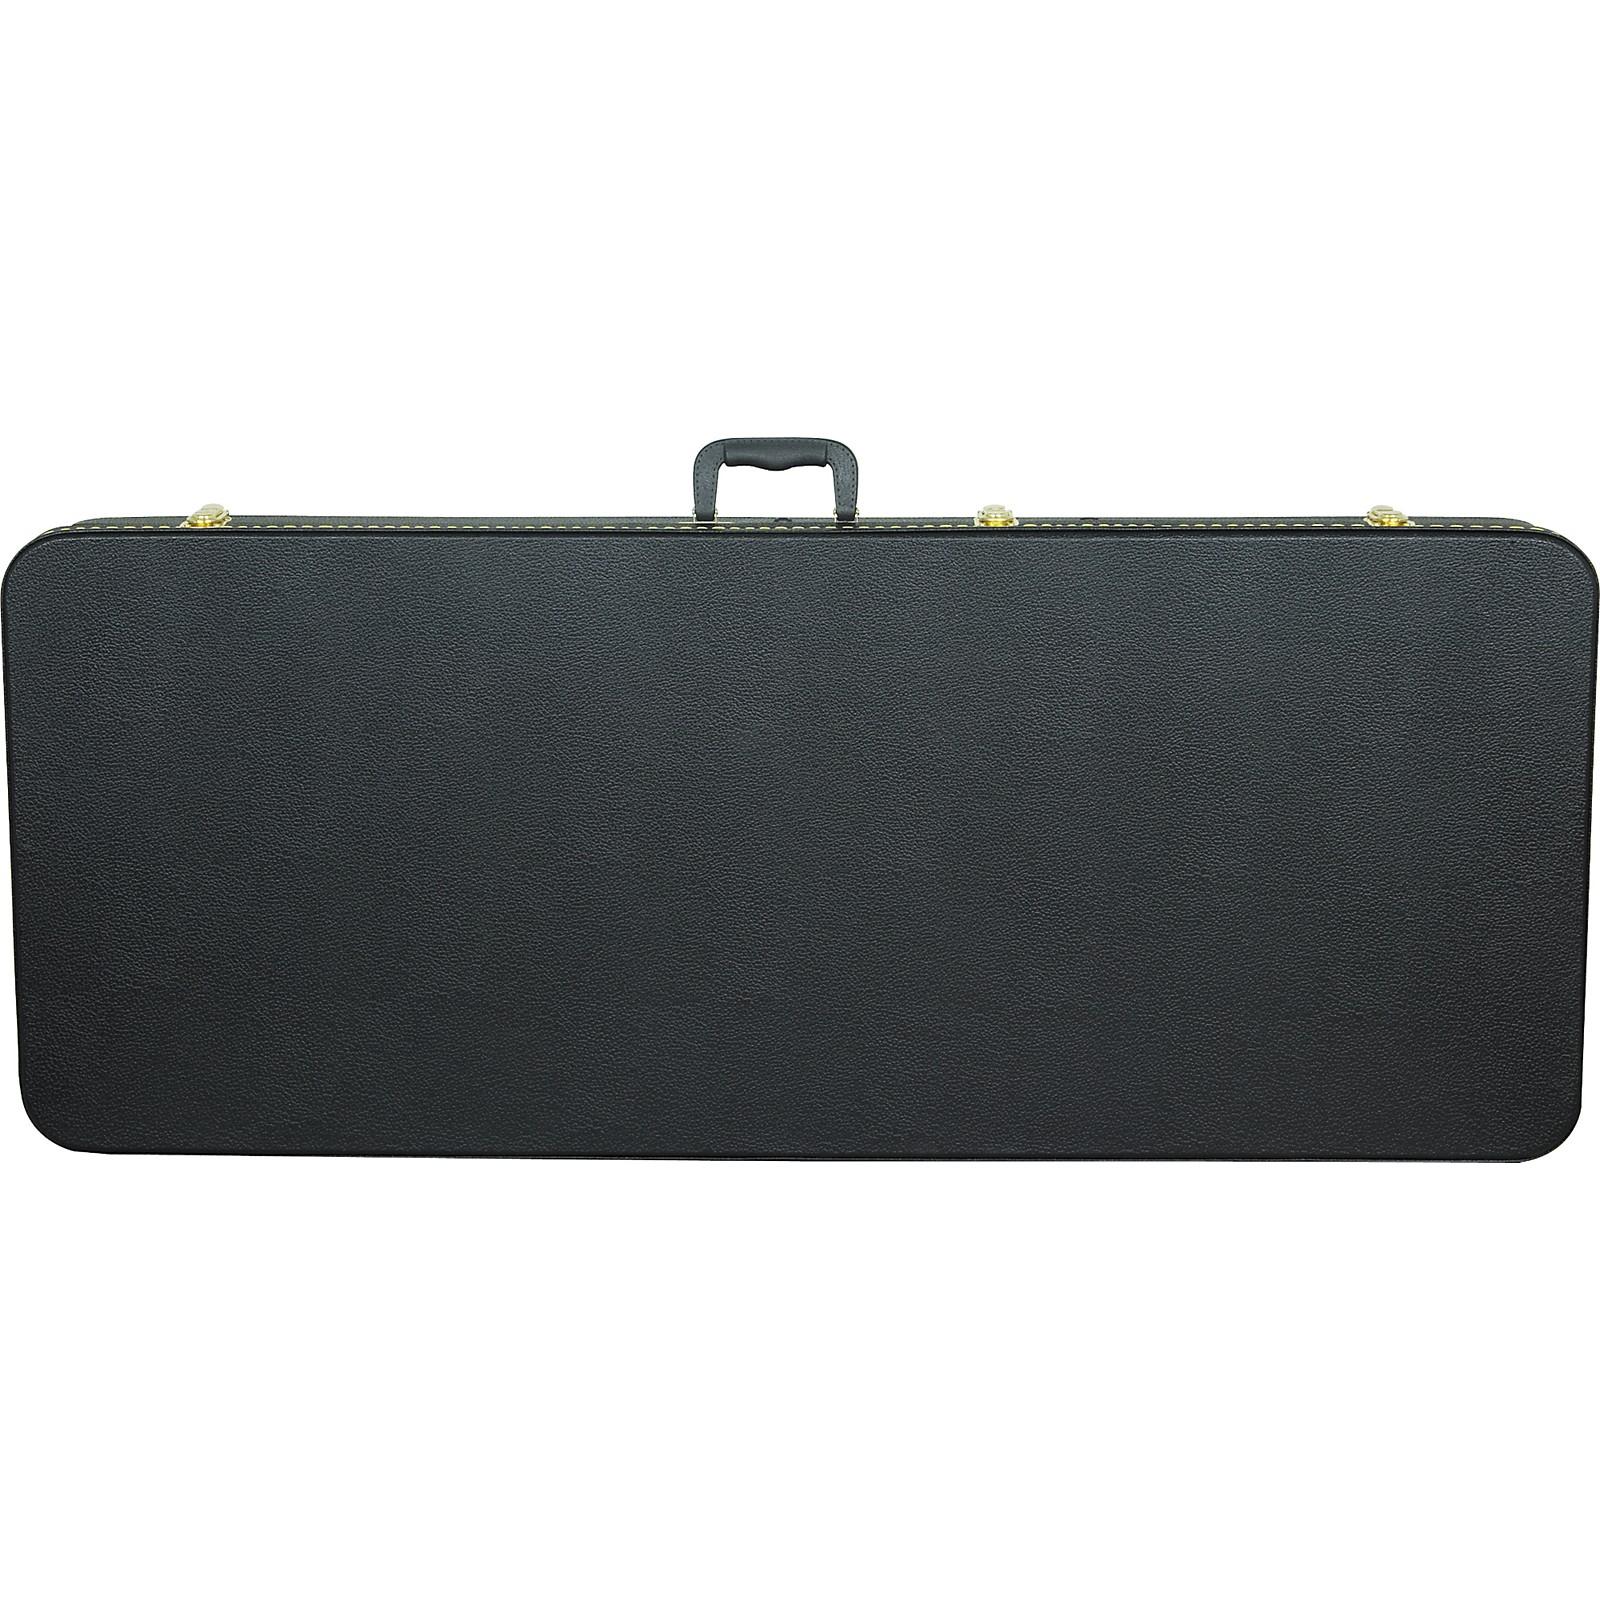 Musician's Gear V-Style Case